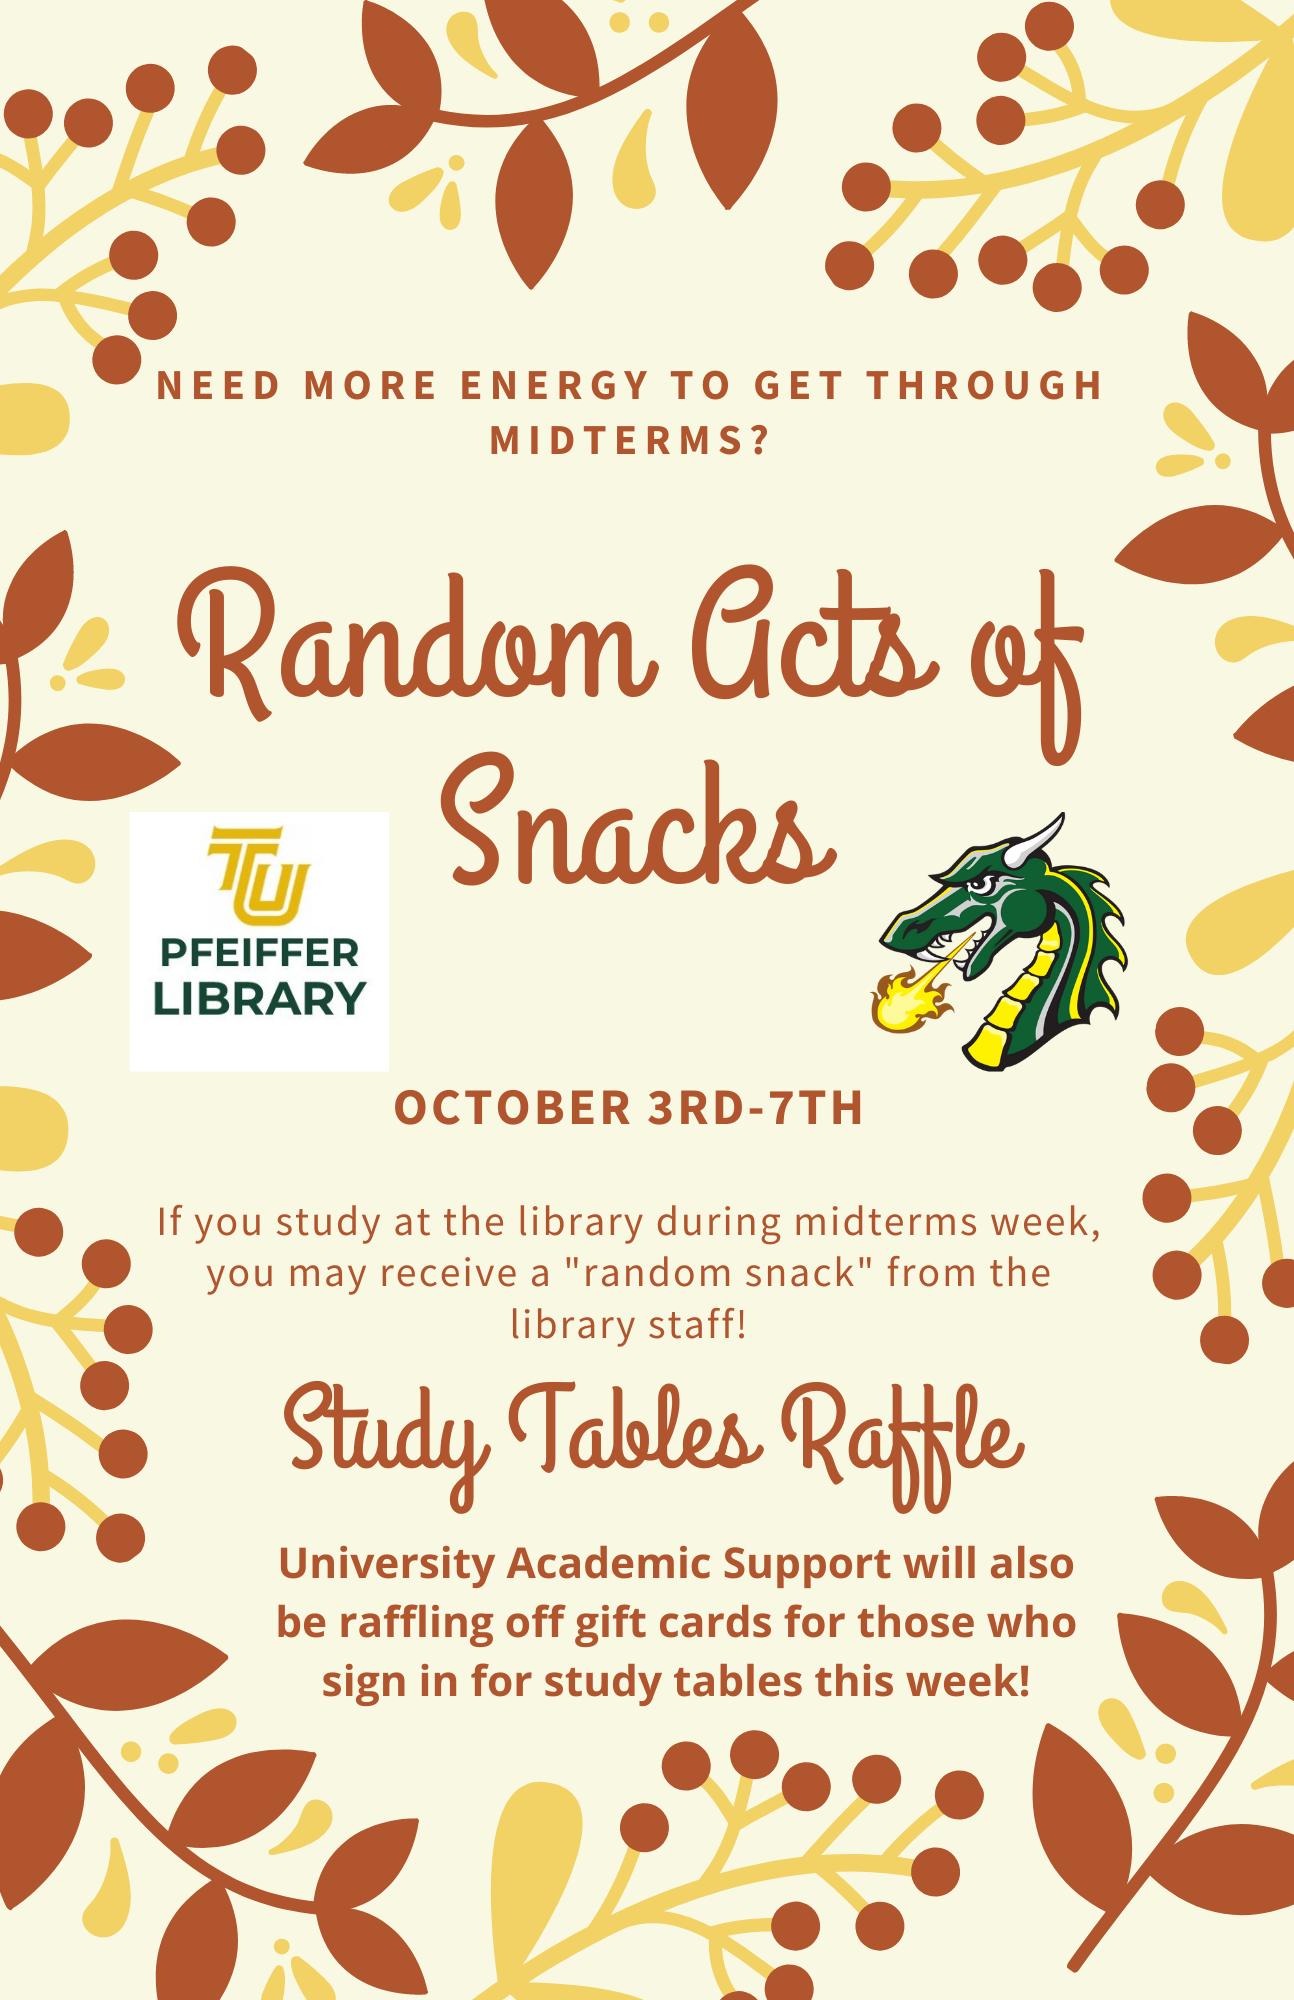 random acts of snacks flyer